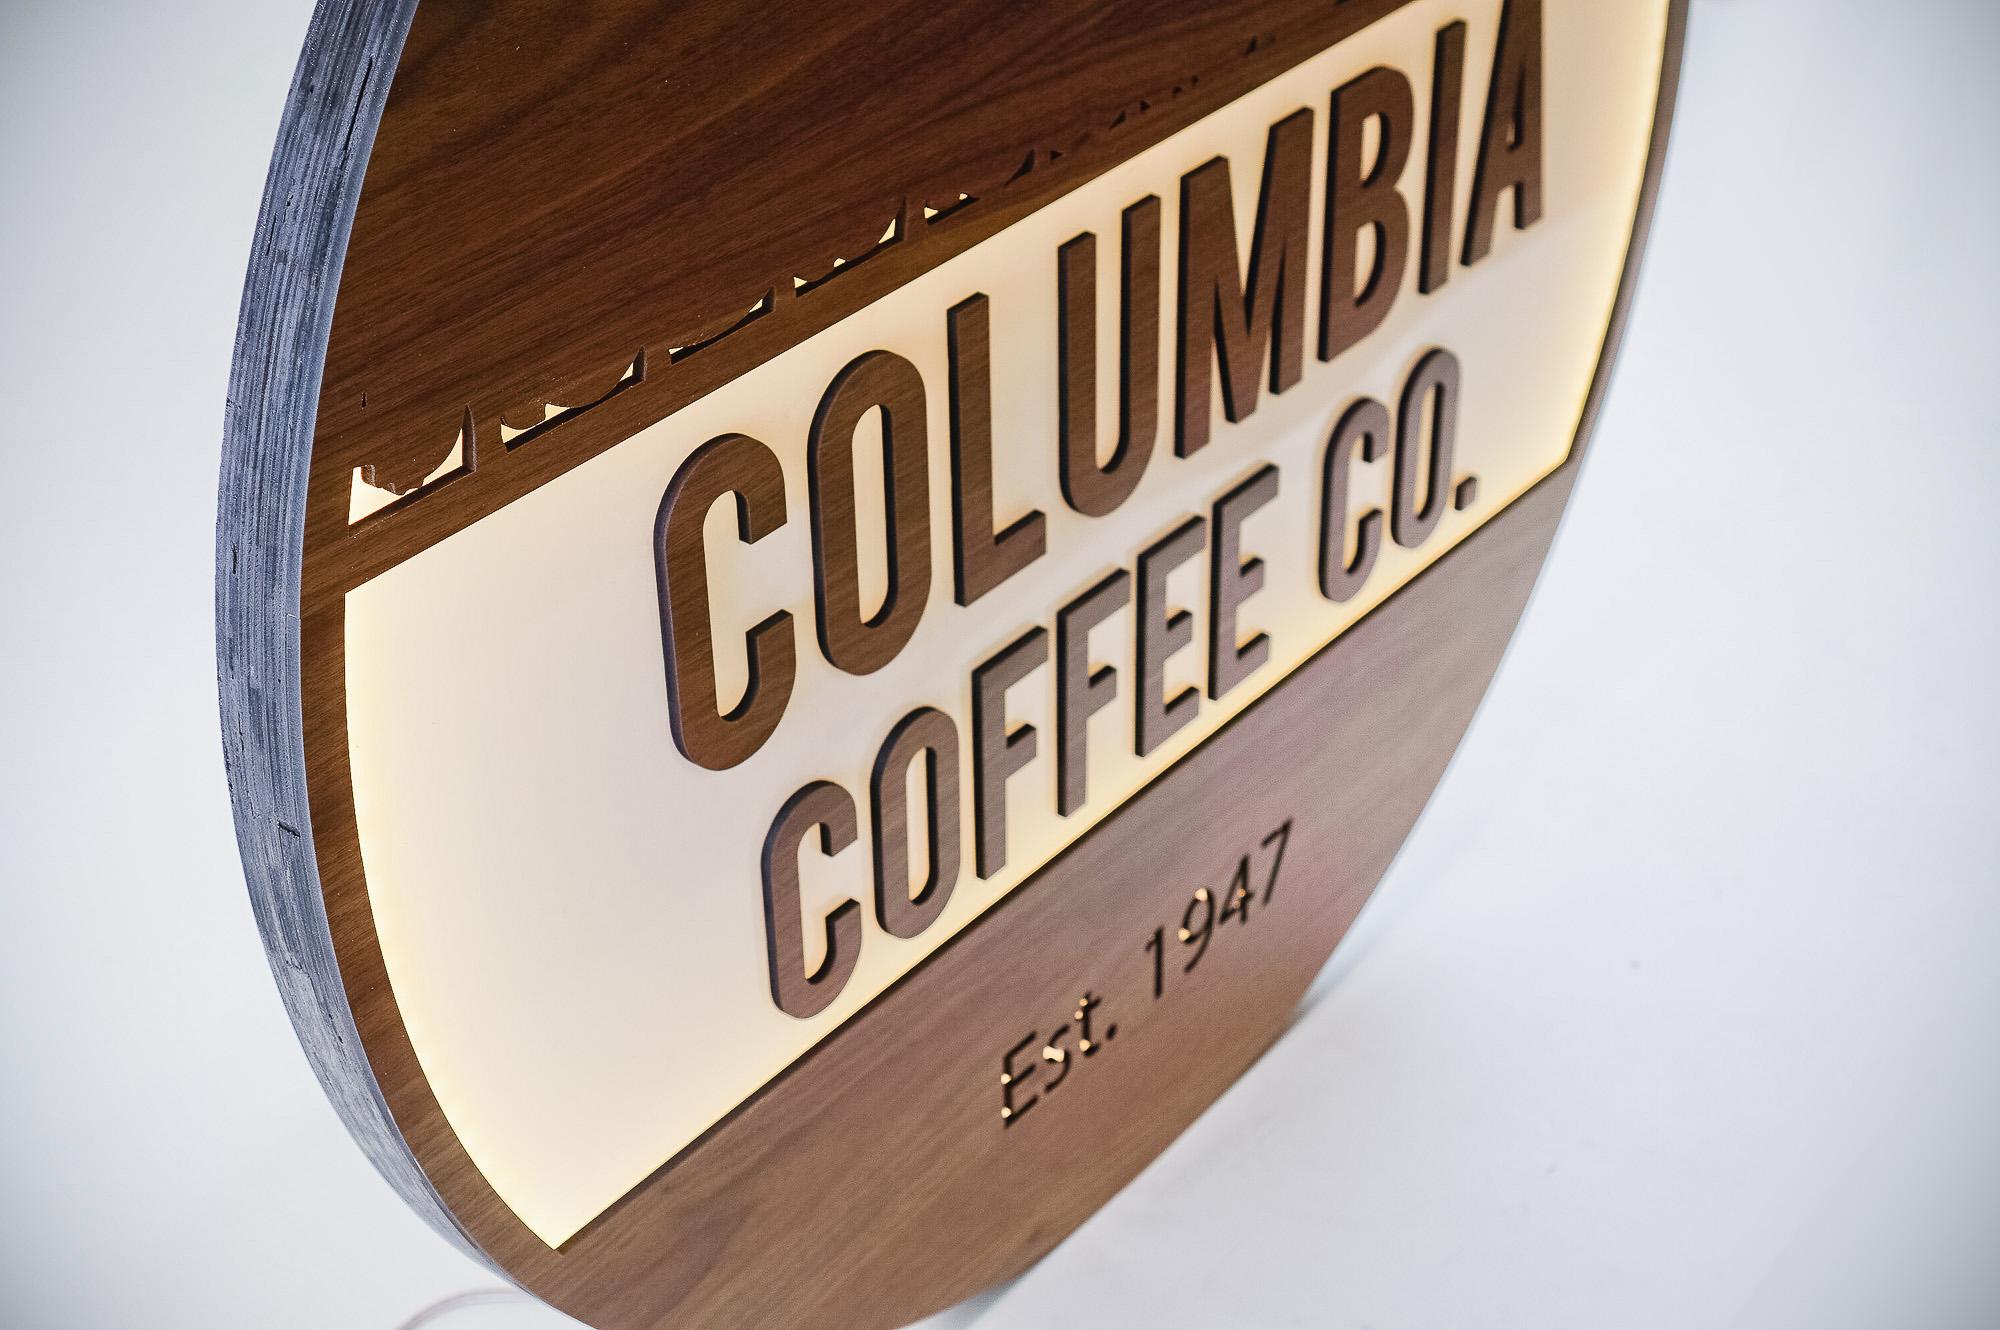 Walnut and white acrylic illuminated cafe sign for Columbia Church, a church in Richland, WA.